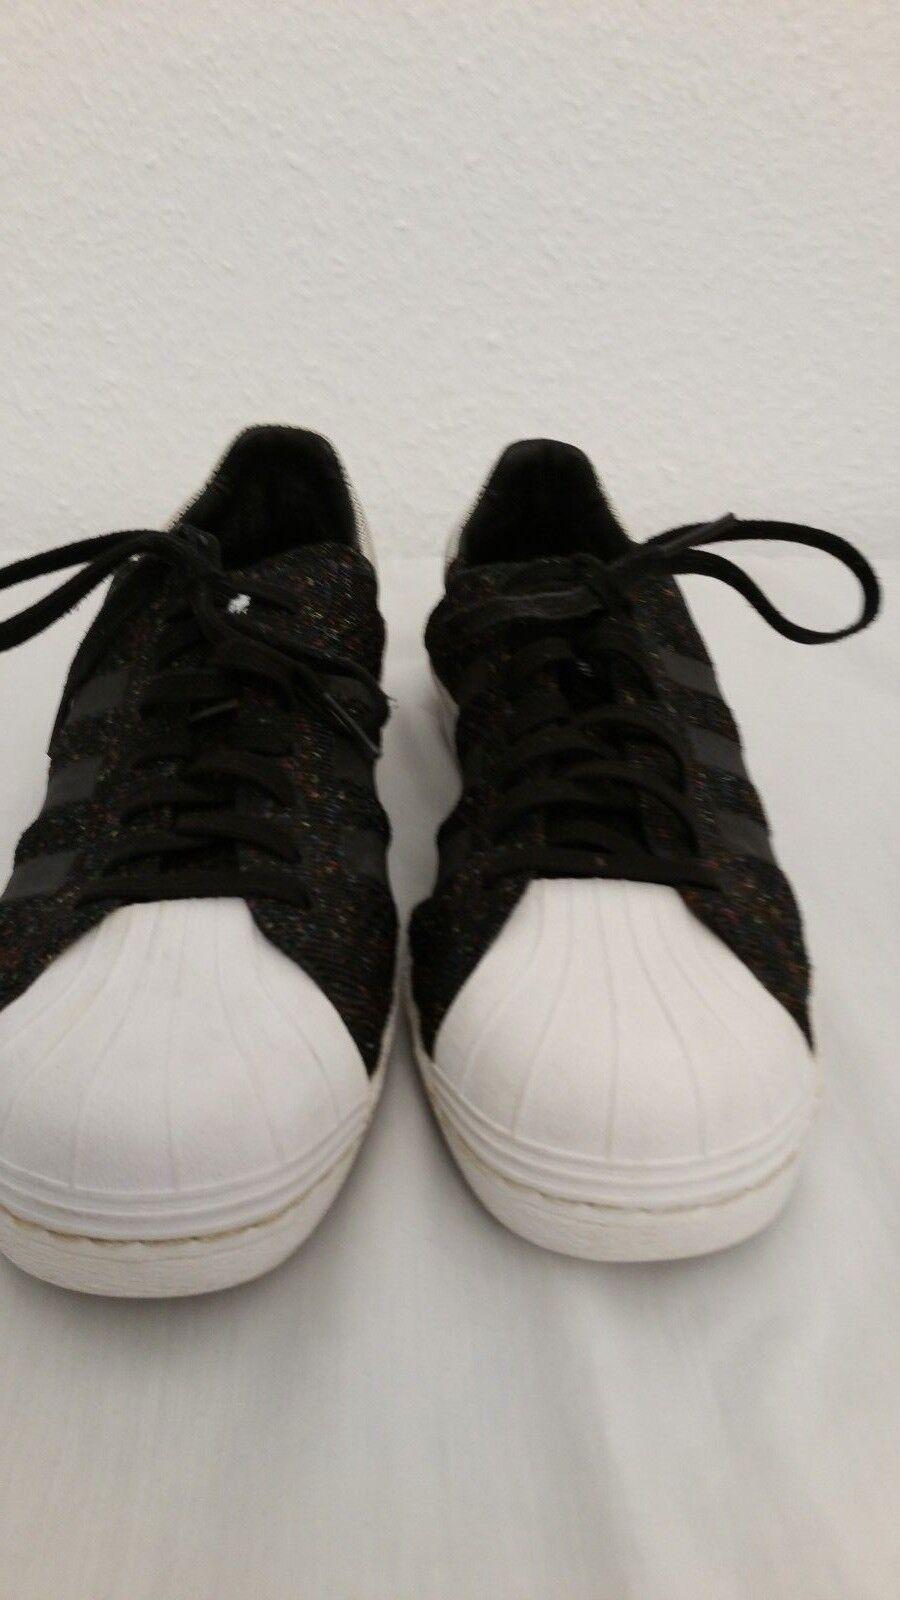 1250---Adidas  la marque UK 9 Gr.43 Stoff,wie neu